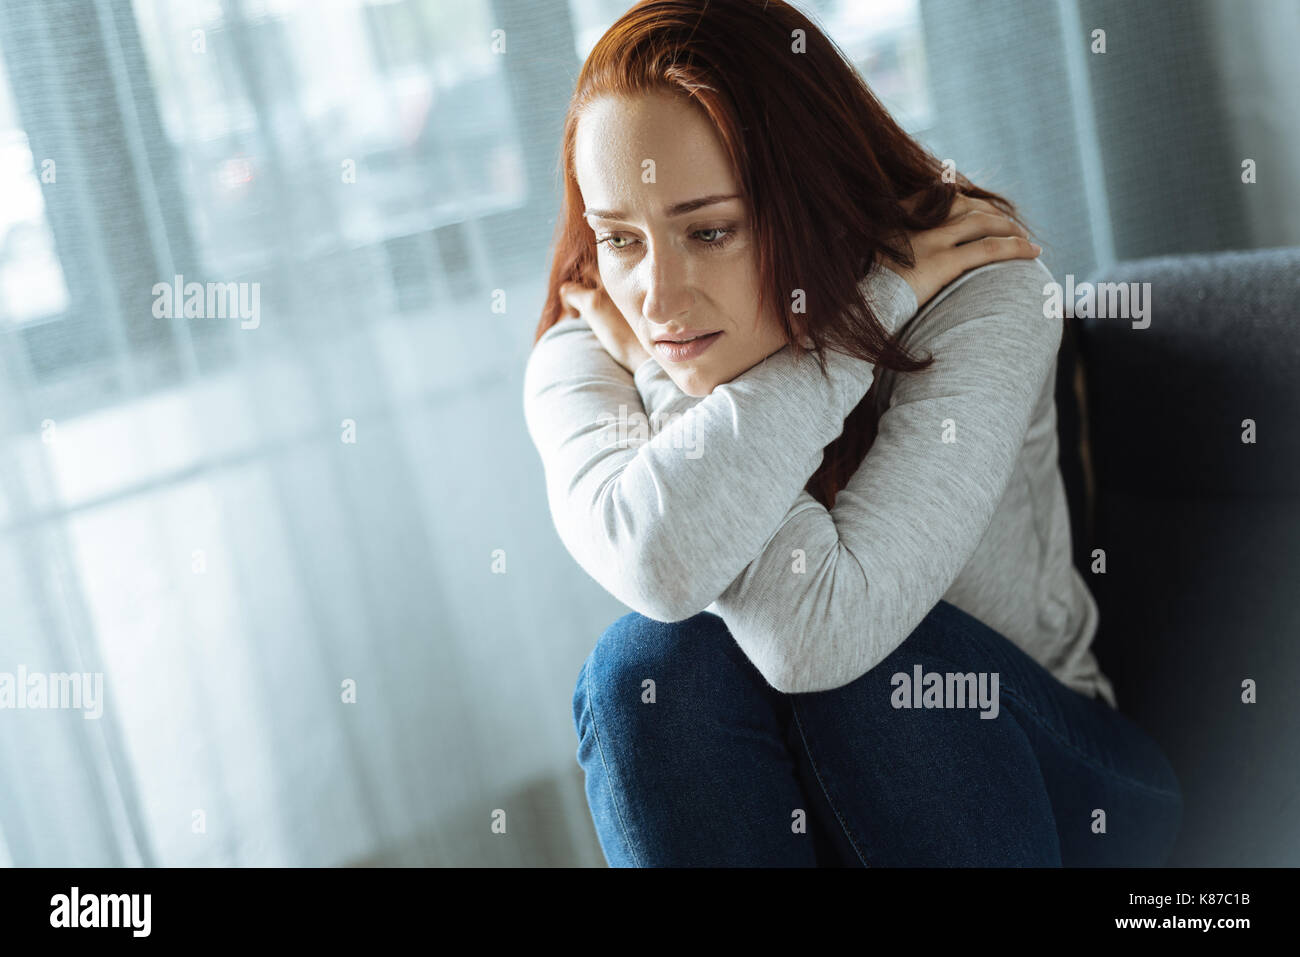 Düstere traurige Frau einsam Stockbild